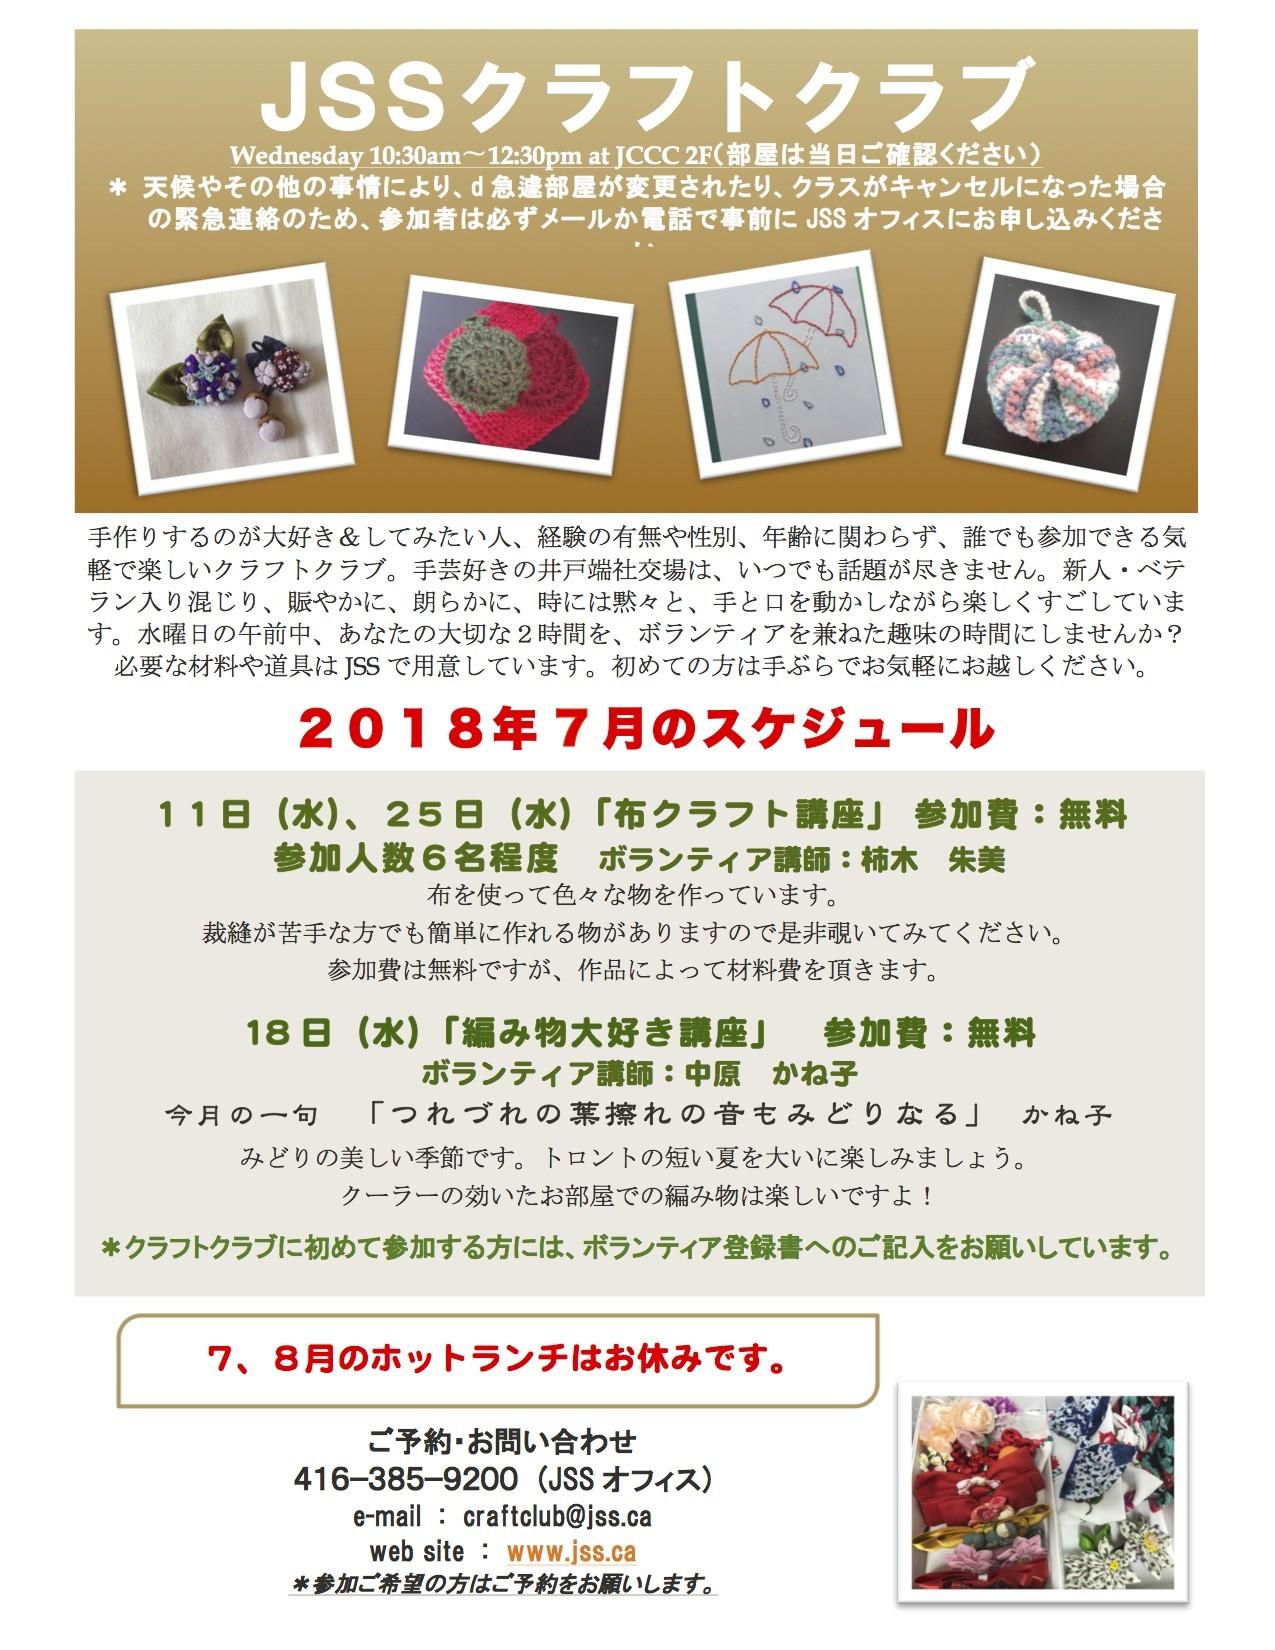 [:ja]JSS クラフトクラブ7月の予定[:en]JSS Craft Club Schedule - July[:]